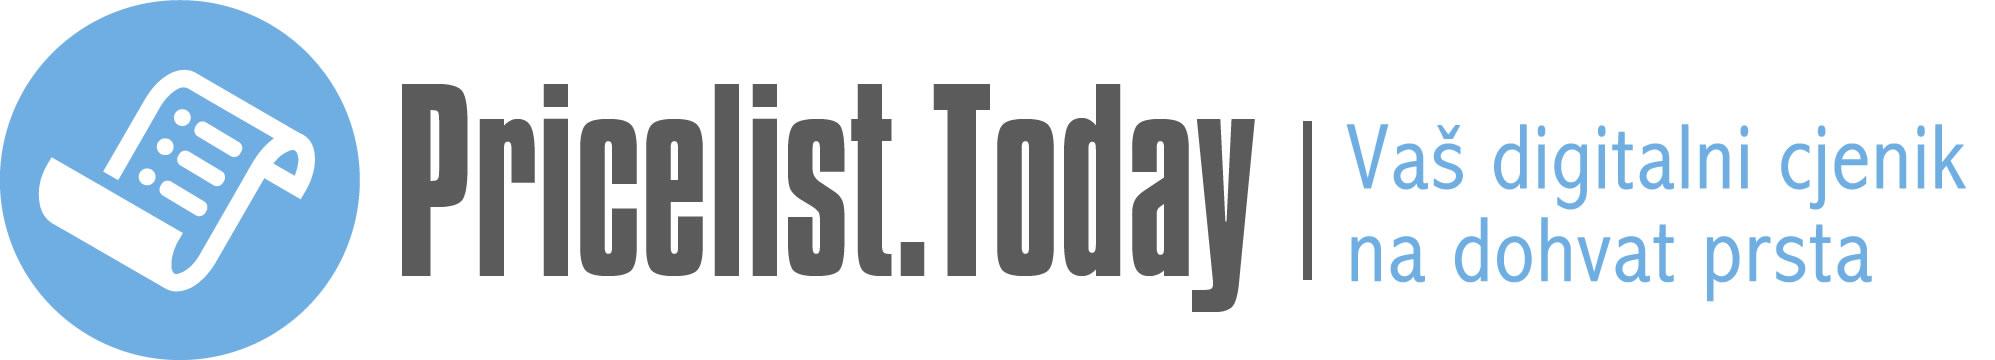 Pricelist.Today | Vaš digitalni cjenik na dohvat prsta